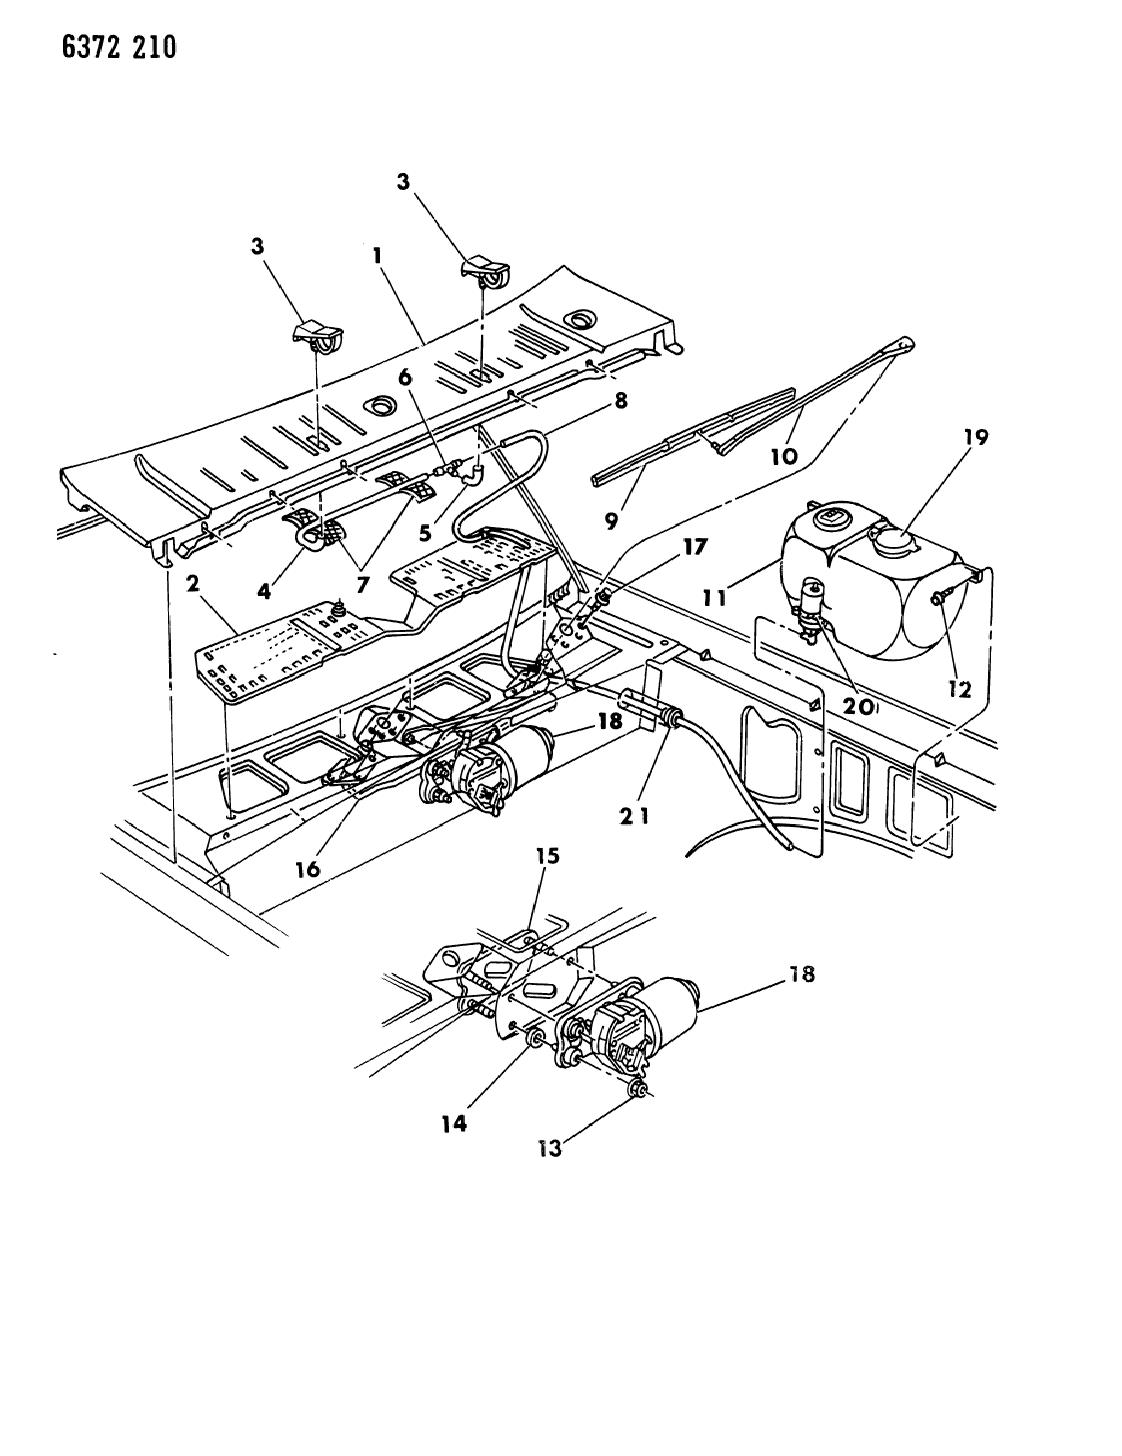 1987 Dakota Wiring Diagram - 8 Pin Atv Cdi Box Wiring Diagram for Wiring  Diagram SchematicsWiring Diagram Schematics